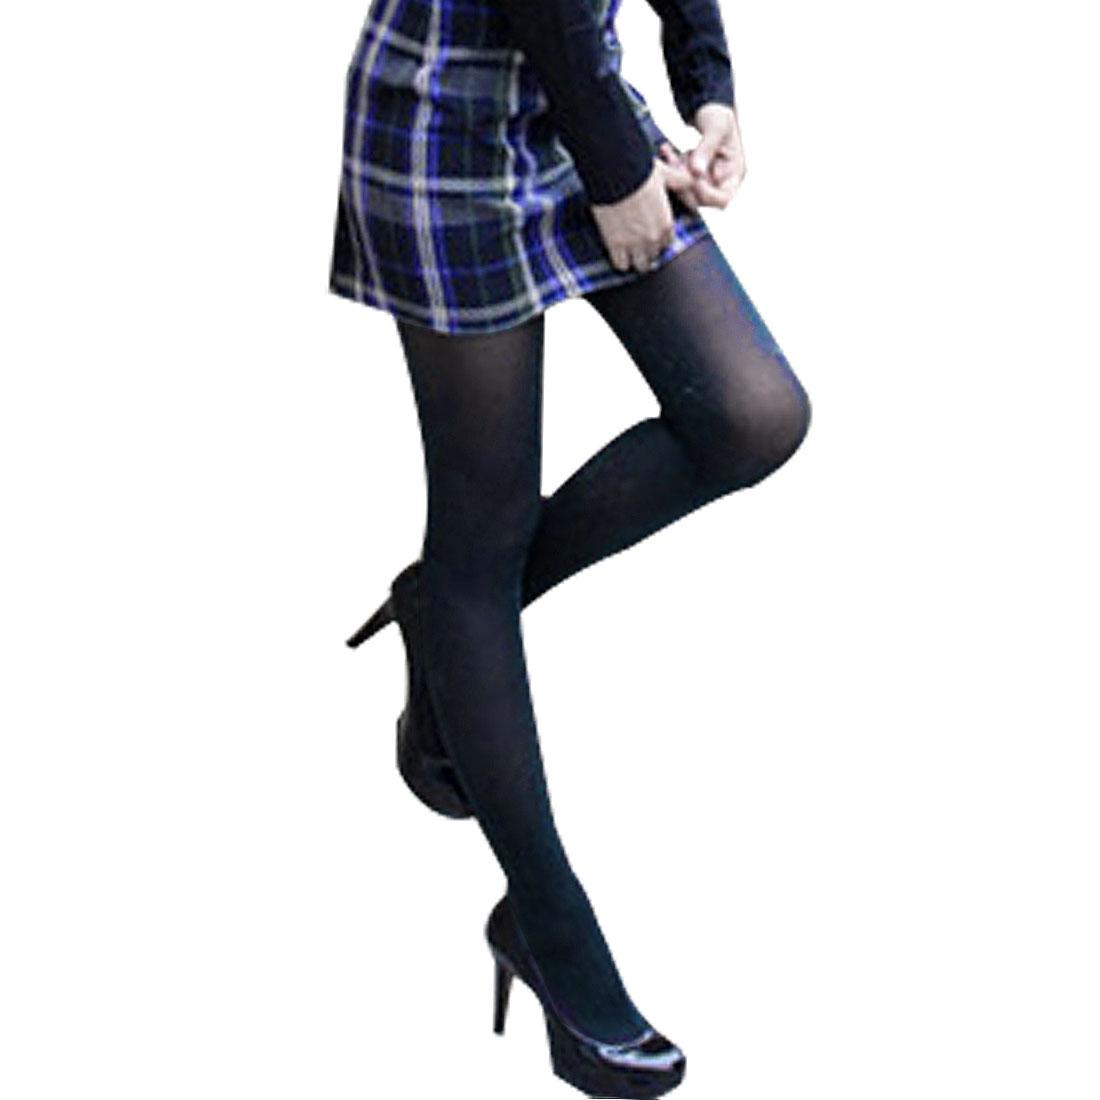 Ladies Elastic Waist Shiny Glossy Blue Glitter Black Pantyhose XS